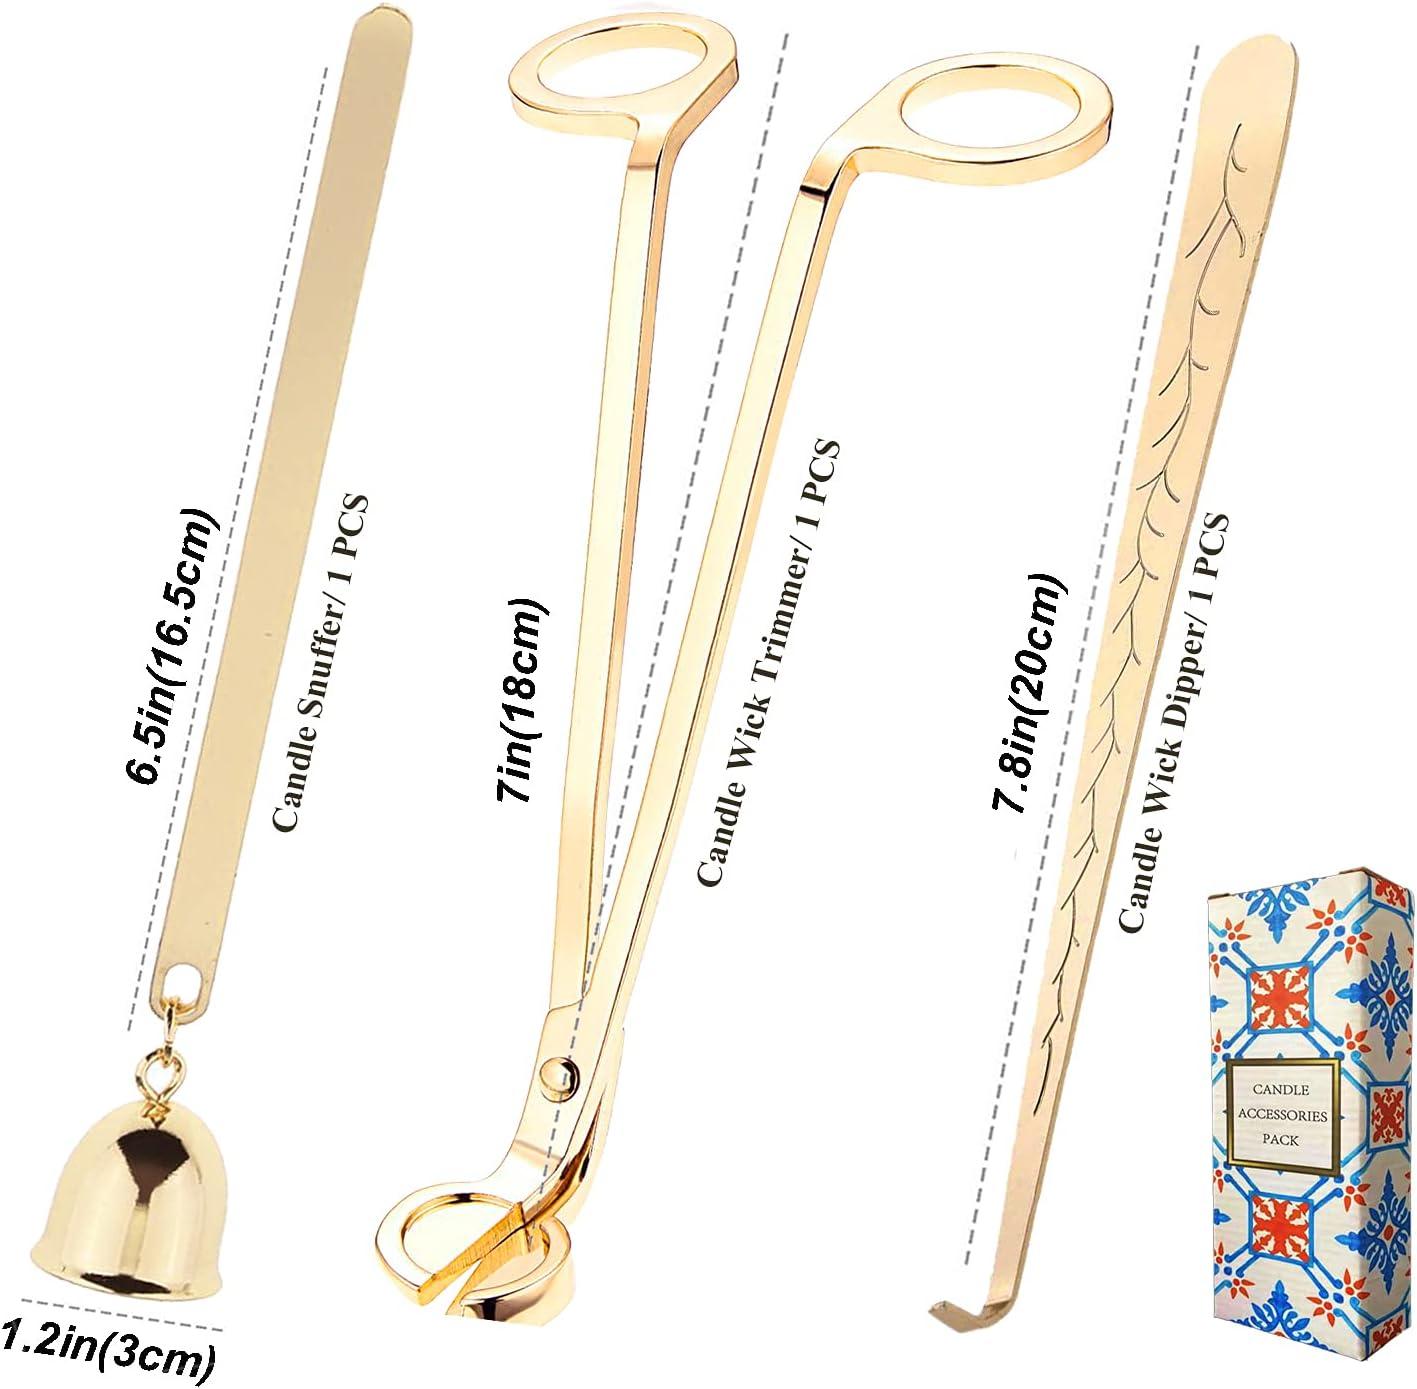 Kerzenl/öscher Dochtschere Edelstahl Wick Wickelschneider BSTCAR 3 St/ück//Set Kerzenzubeh/örset Aromatherapie Wachs Pflege Tool Kit